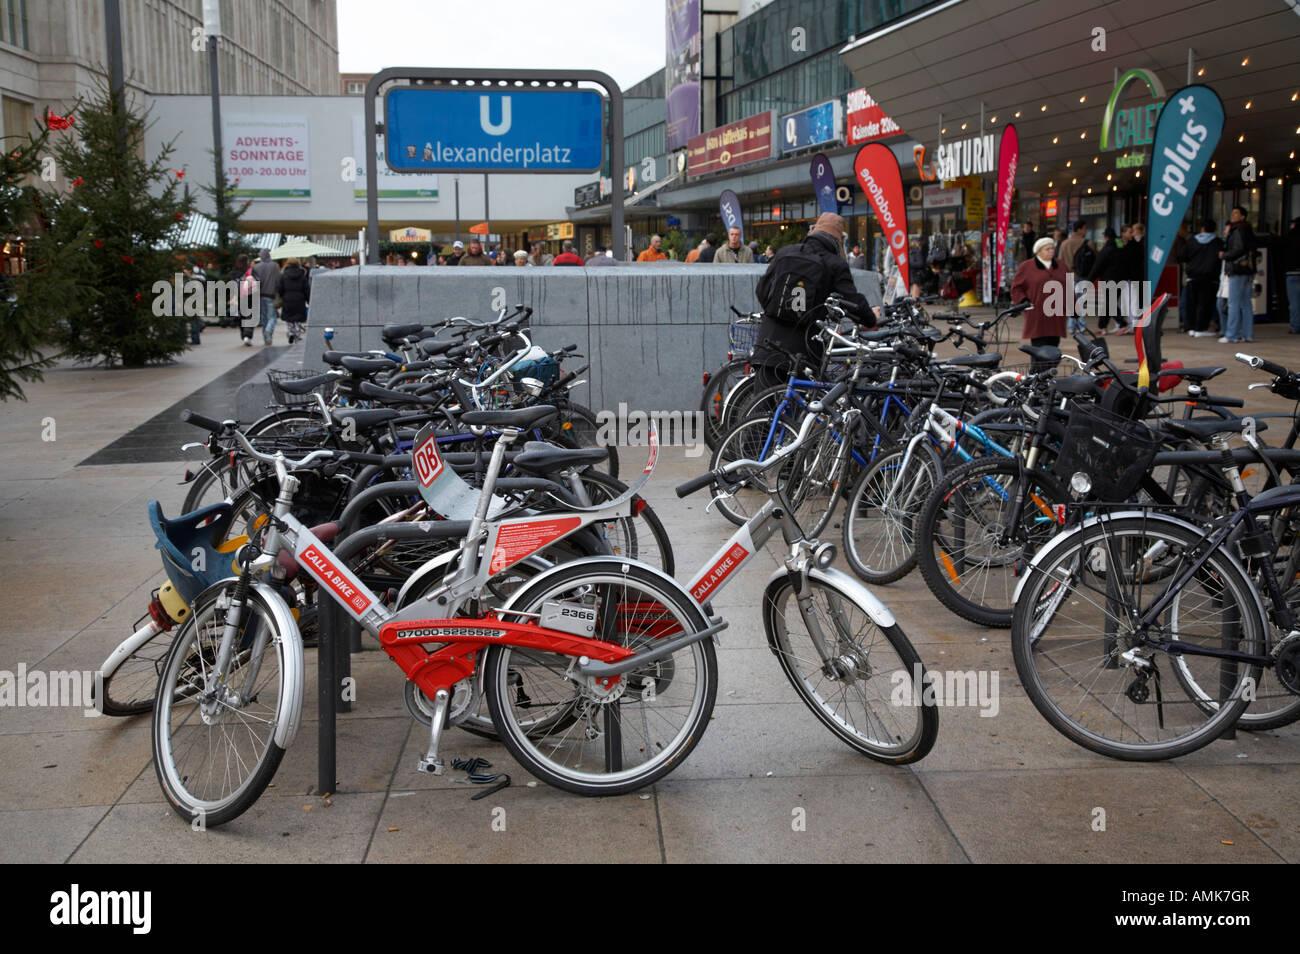 Bicycles Parked And Locked In Bike Park Near Alexanderplatz U Bahn